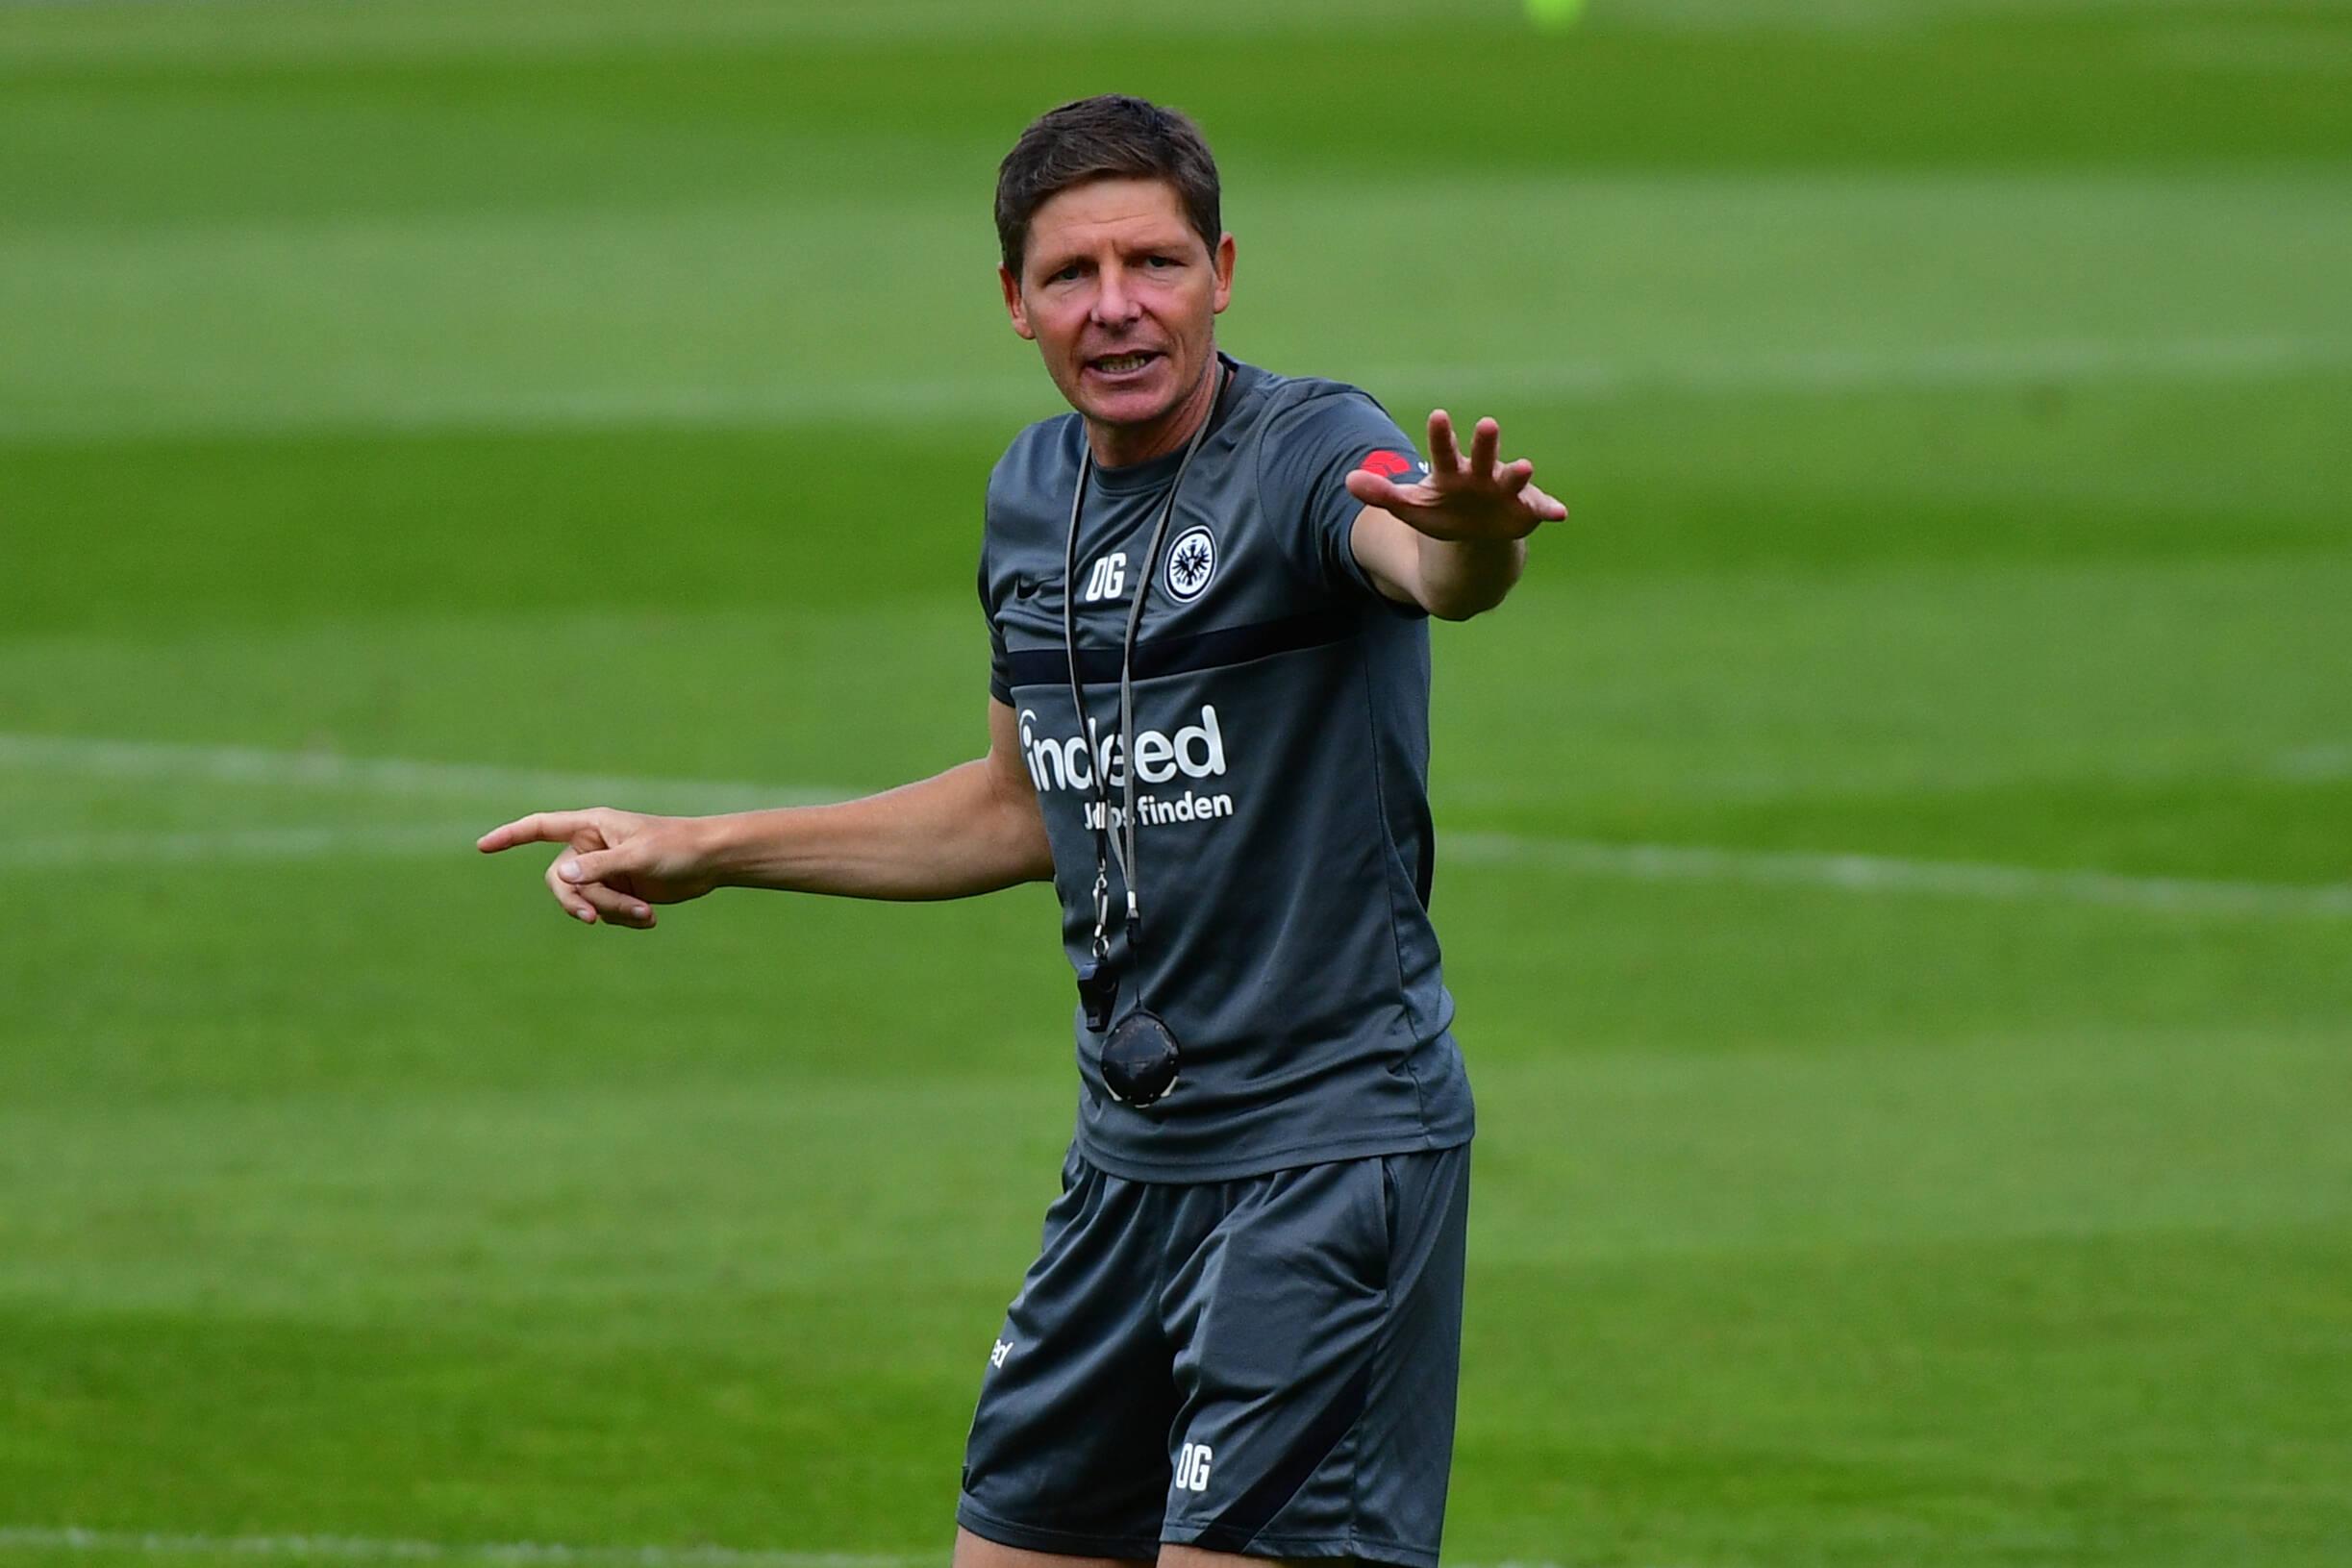 Oliver Glasner abre la polémica entre Eintracht Frankfurt y Wolfsburg. Foto: Imago.